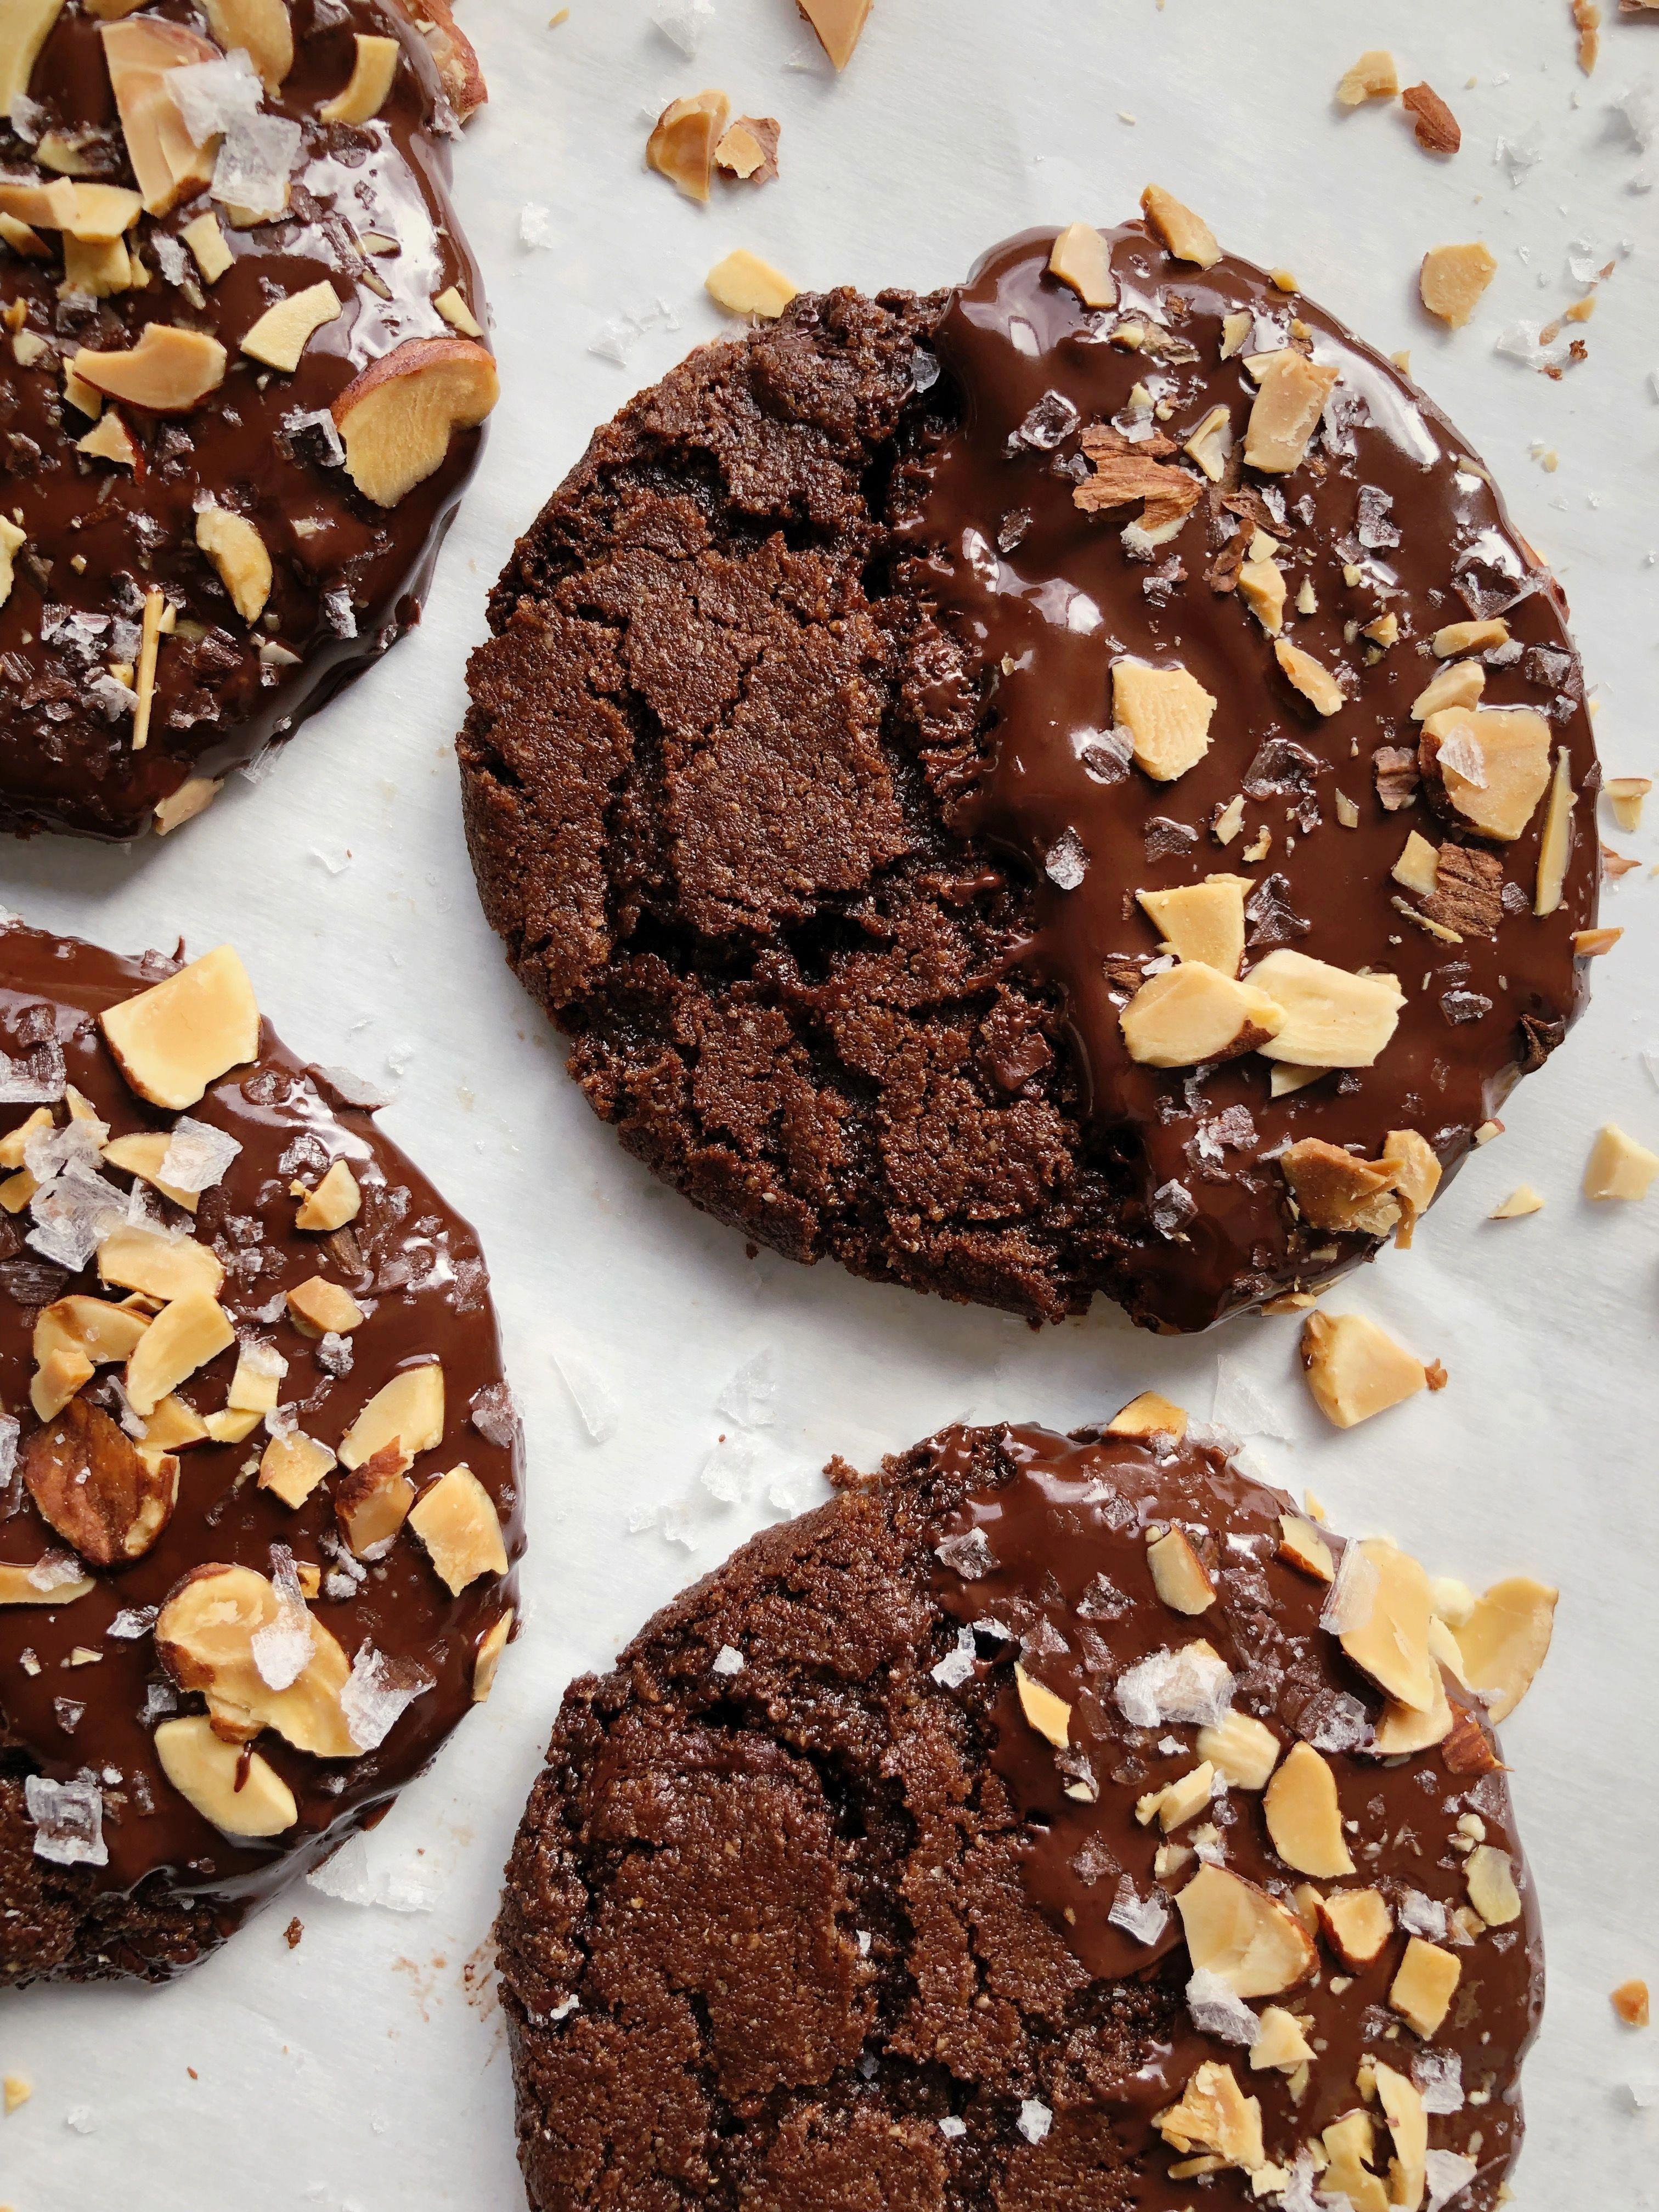 Salted Dark Chocolate Almond Milk Cookies with Toasted Almonds Dark Chocolate Almond Milk Cookies with Toasted Almonds